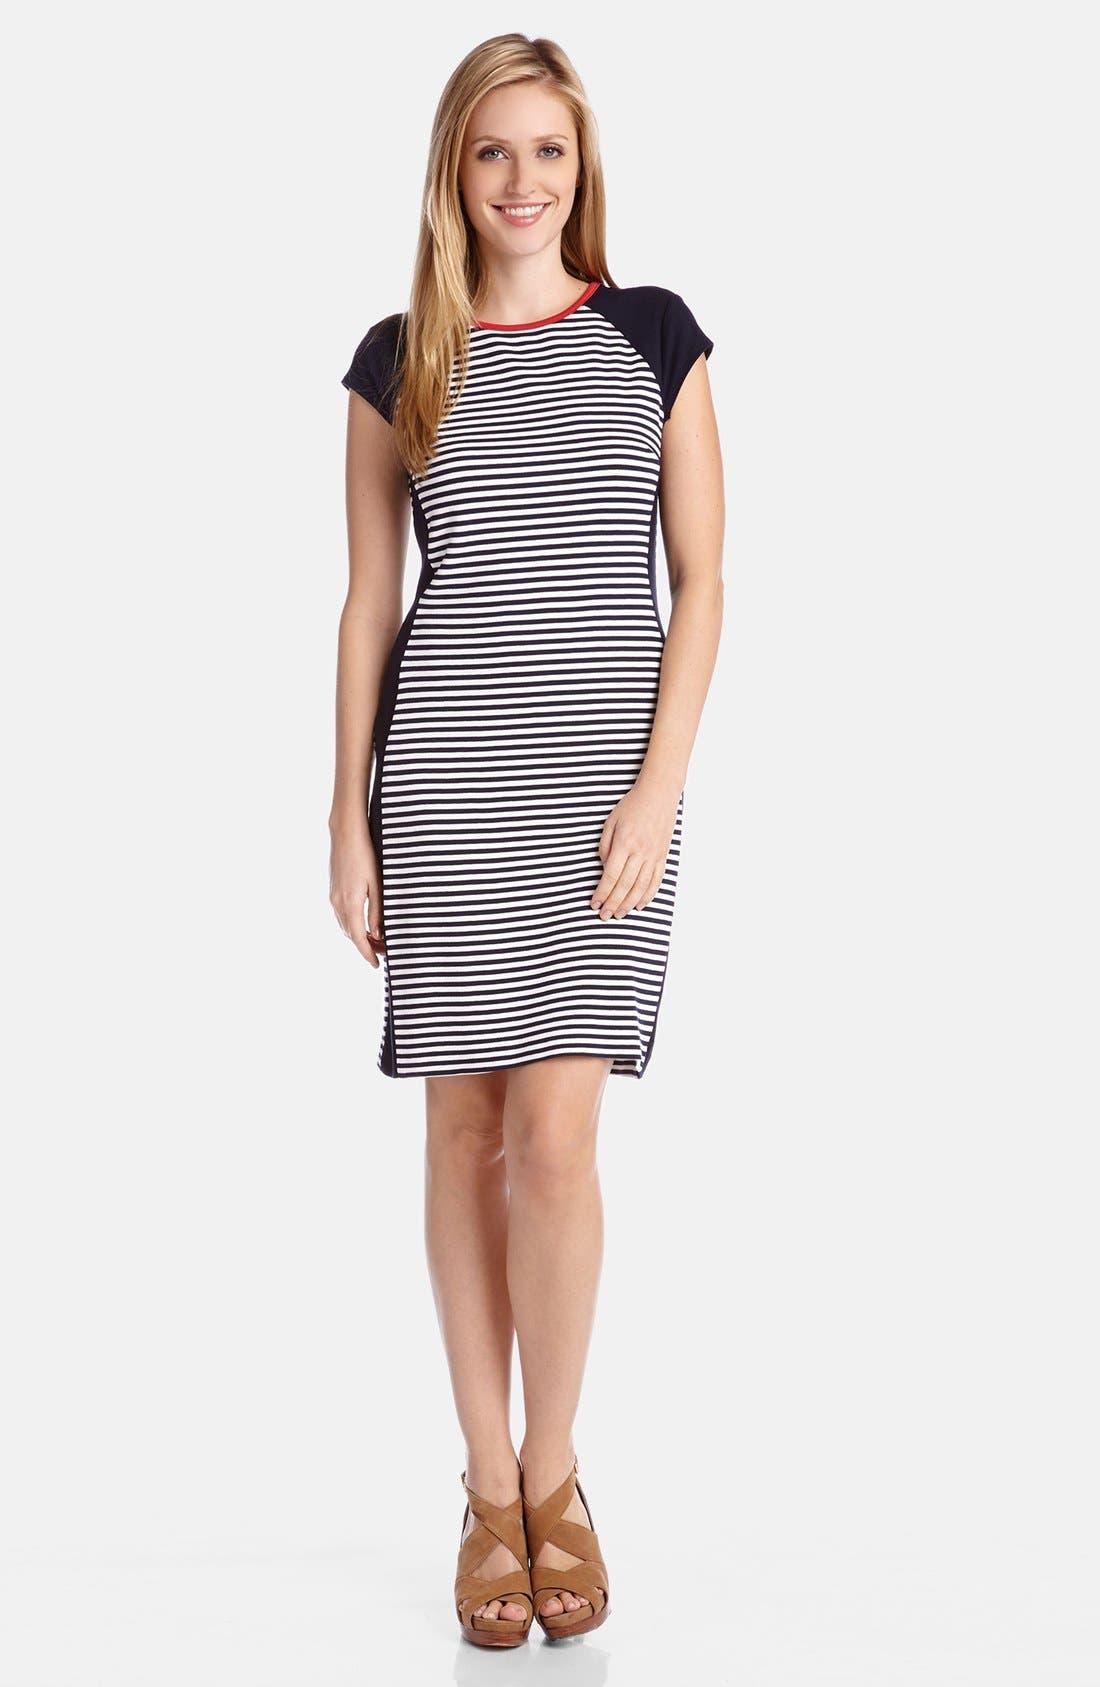 Alternate Image 1 Selected - Karen Kane Colorblock Stripe Knit Sheath Dress